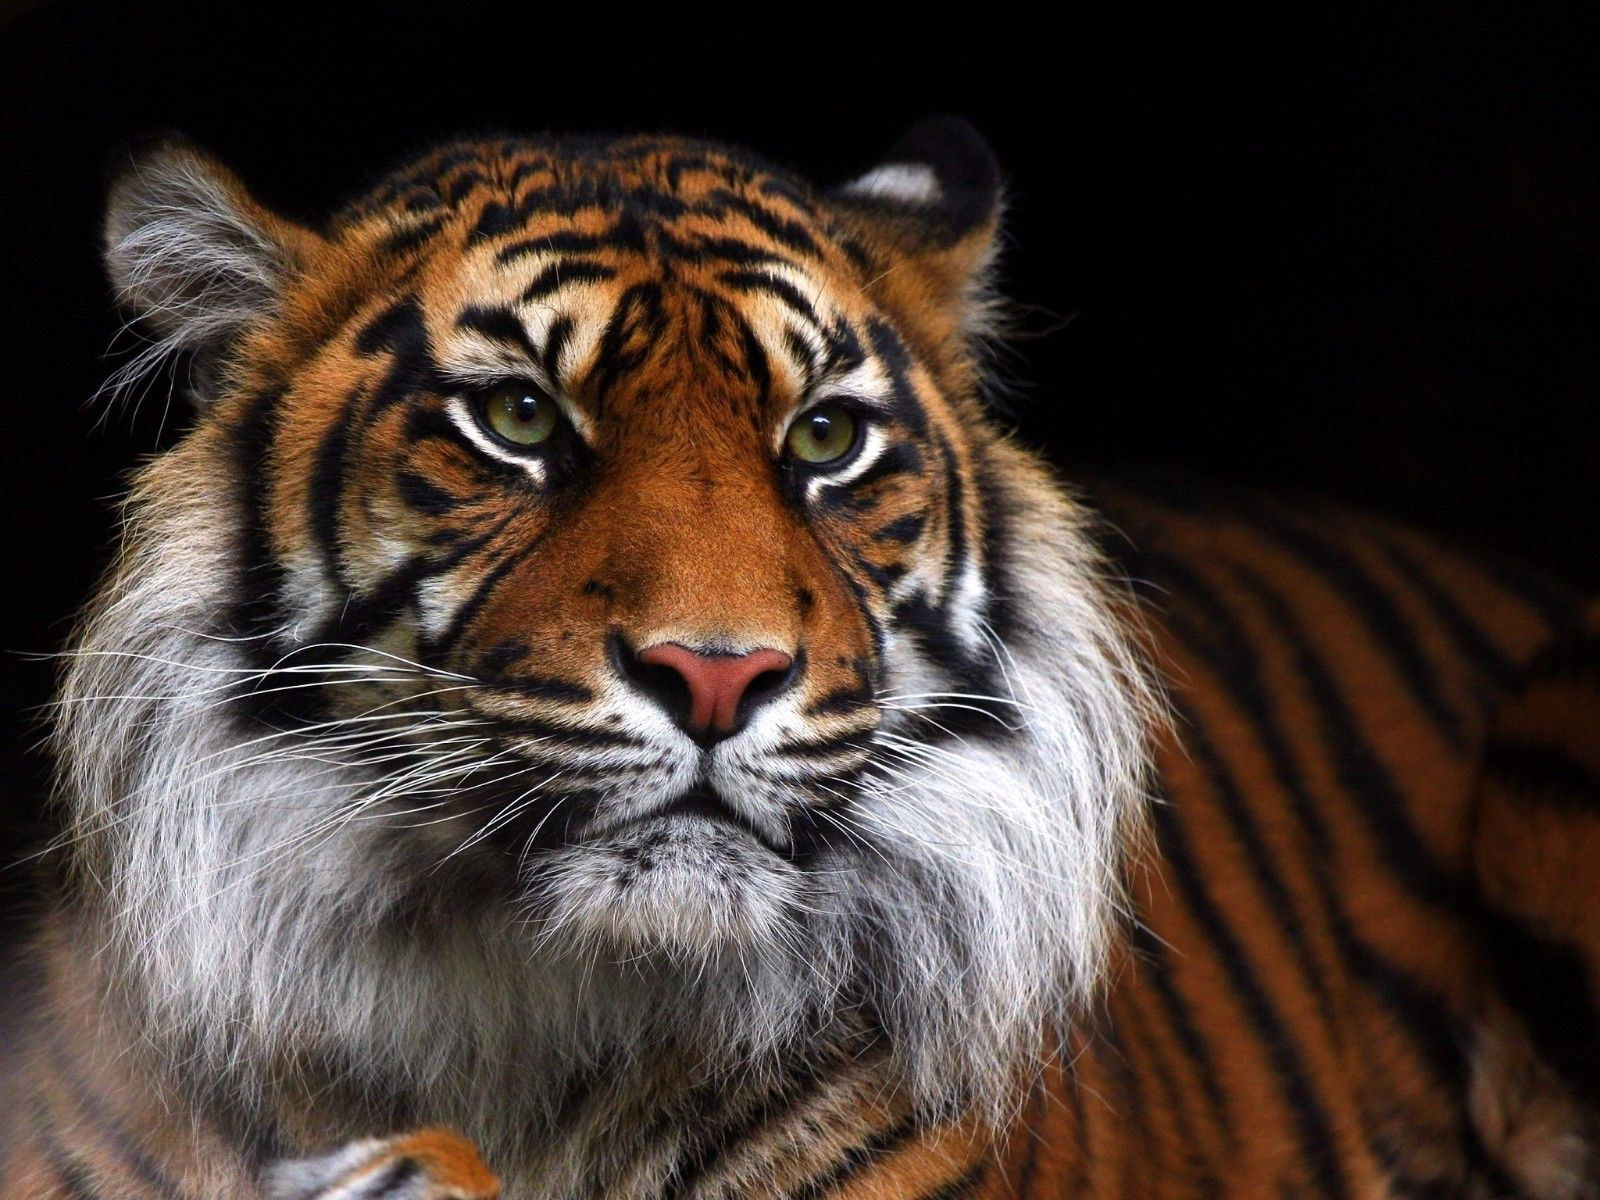 127034 Tiger Wild Cat Decor WALL PRINT POSTER AU